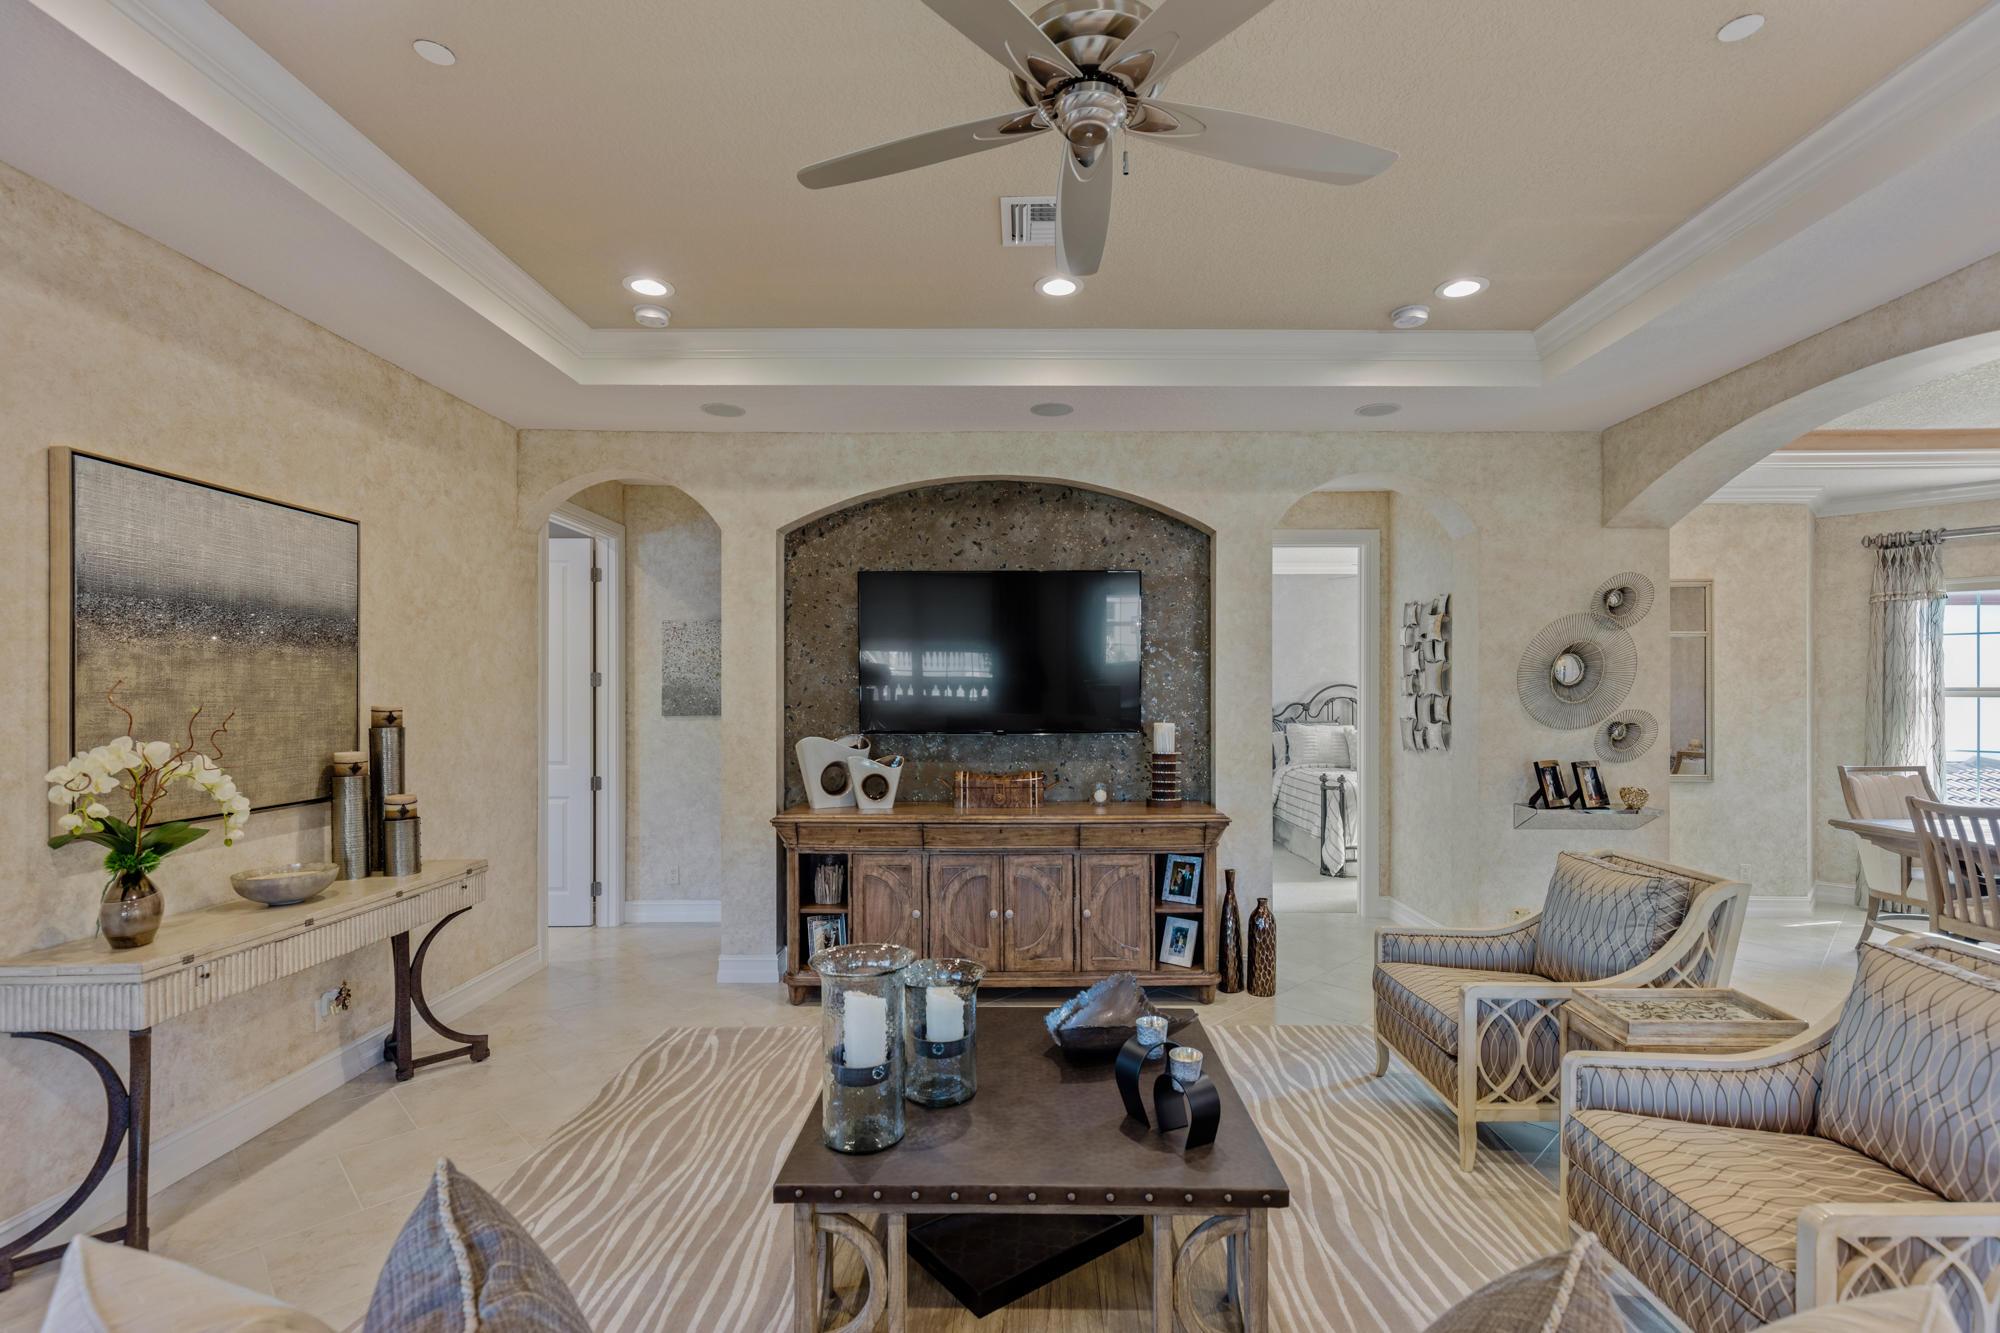 107 Tresana Boulevard 17, Jupiter, Florida 33478, 3 Bedrooms Bedrooms, ,3 BathroomsBathrooms,A,Condominium,Tresana,RX-10509685